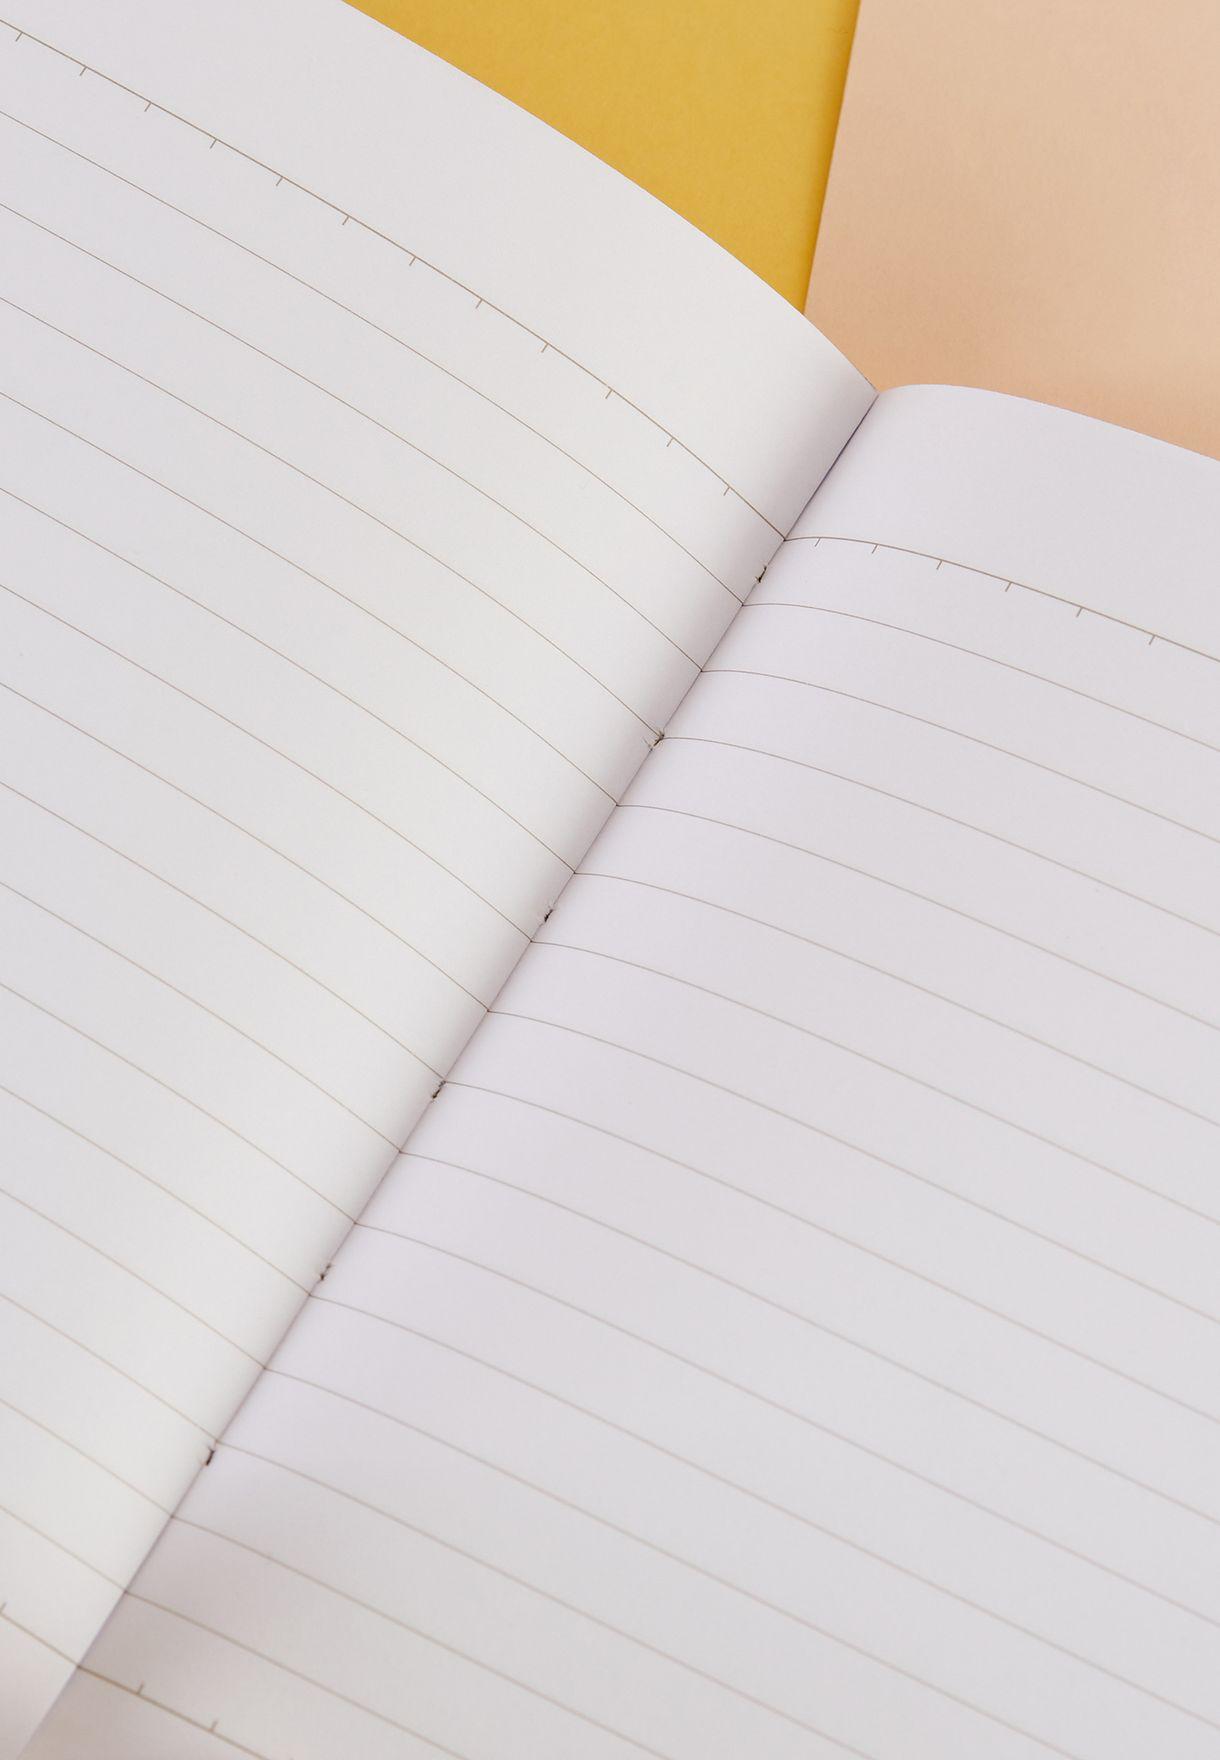 دفتر ملاحظات A6 برج العذراء